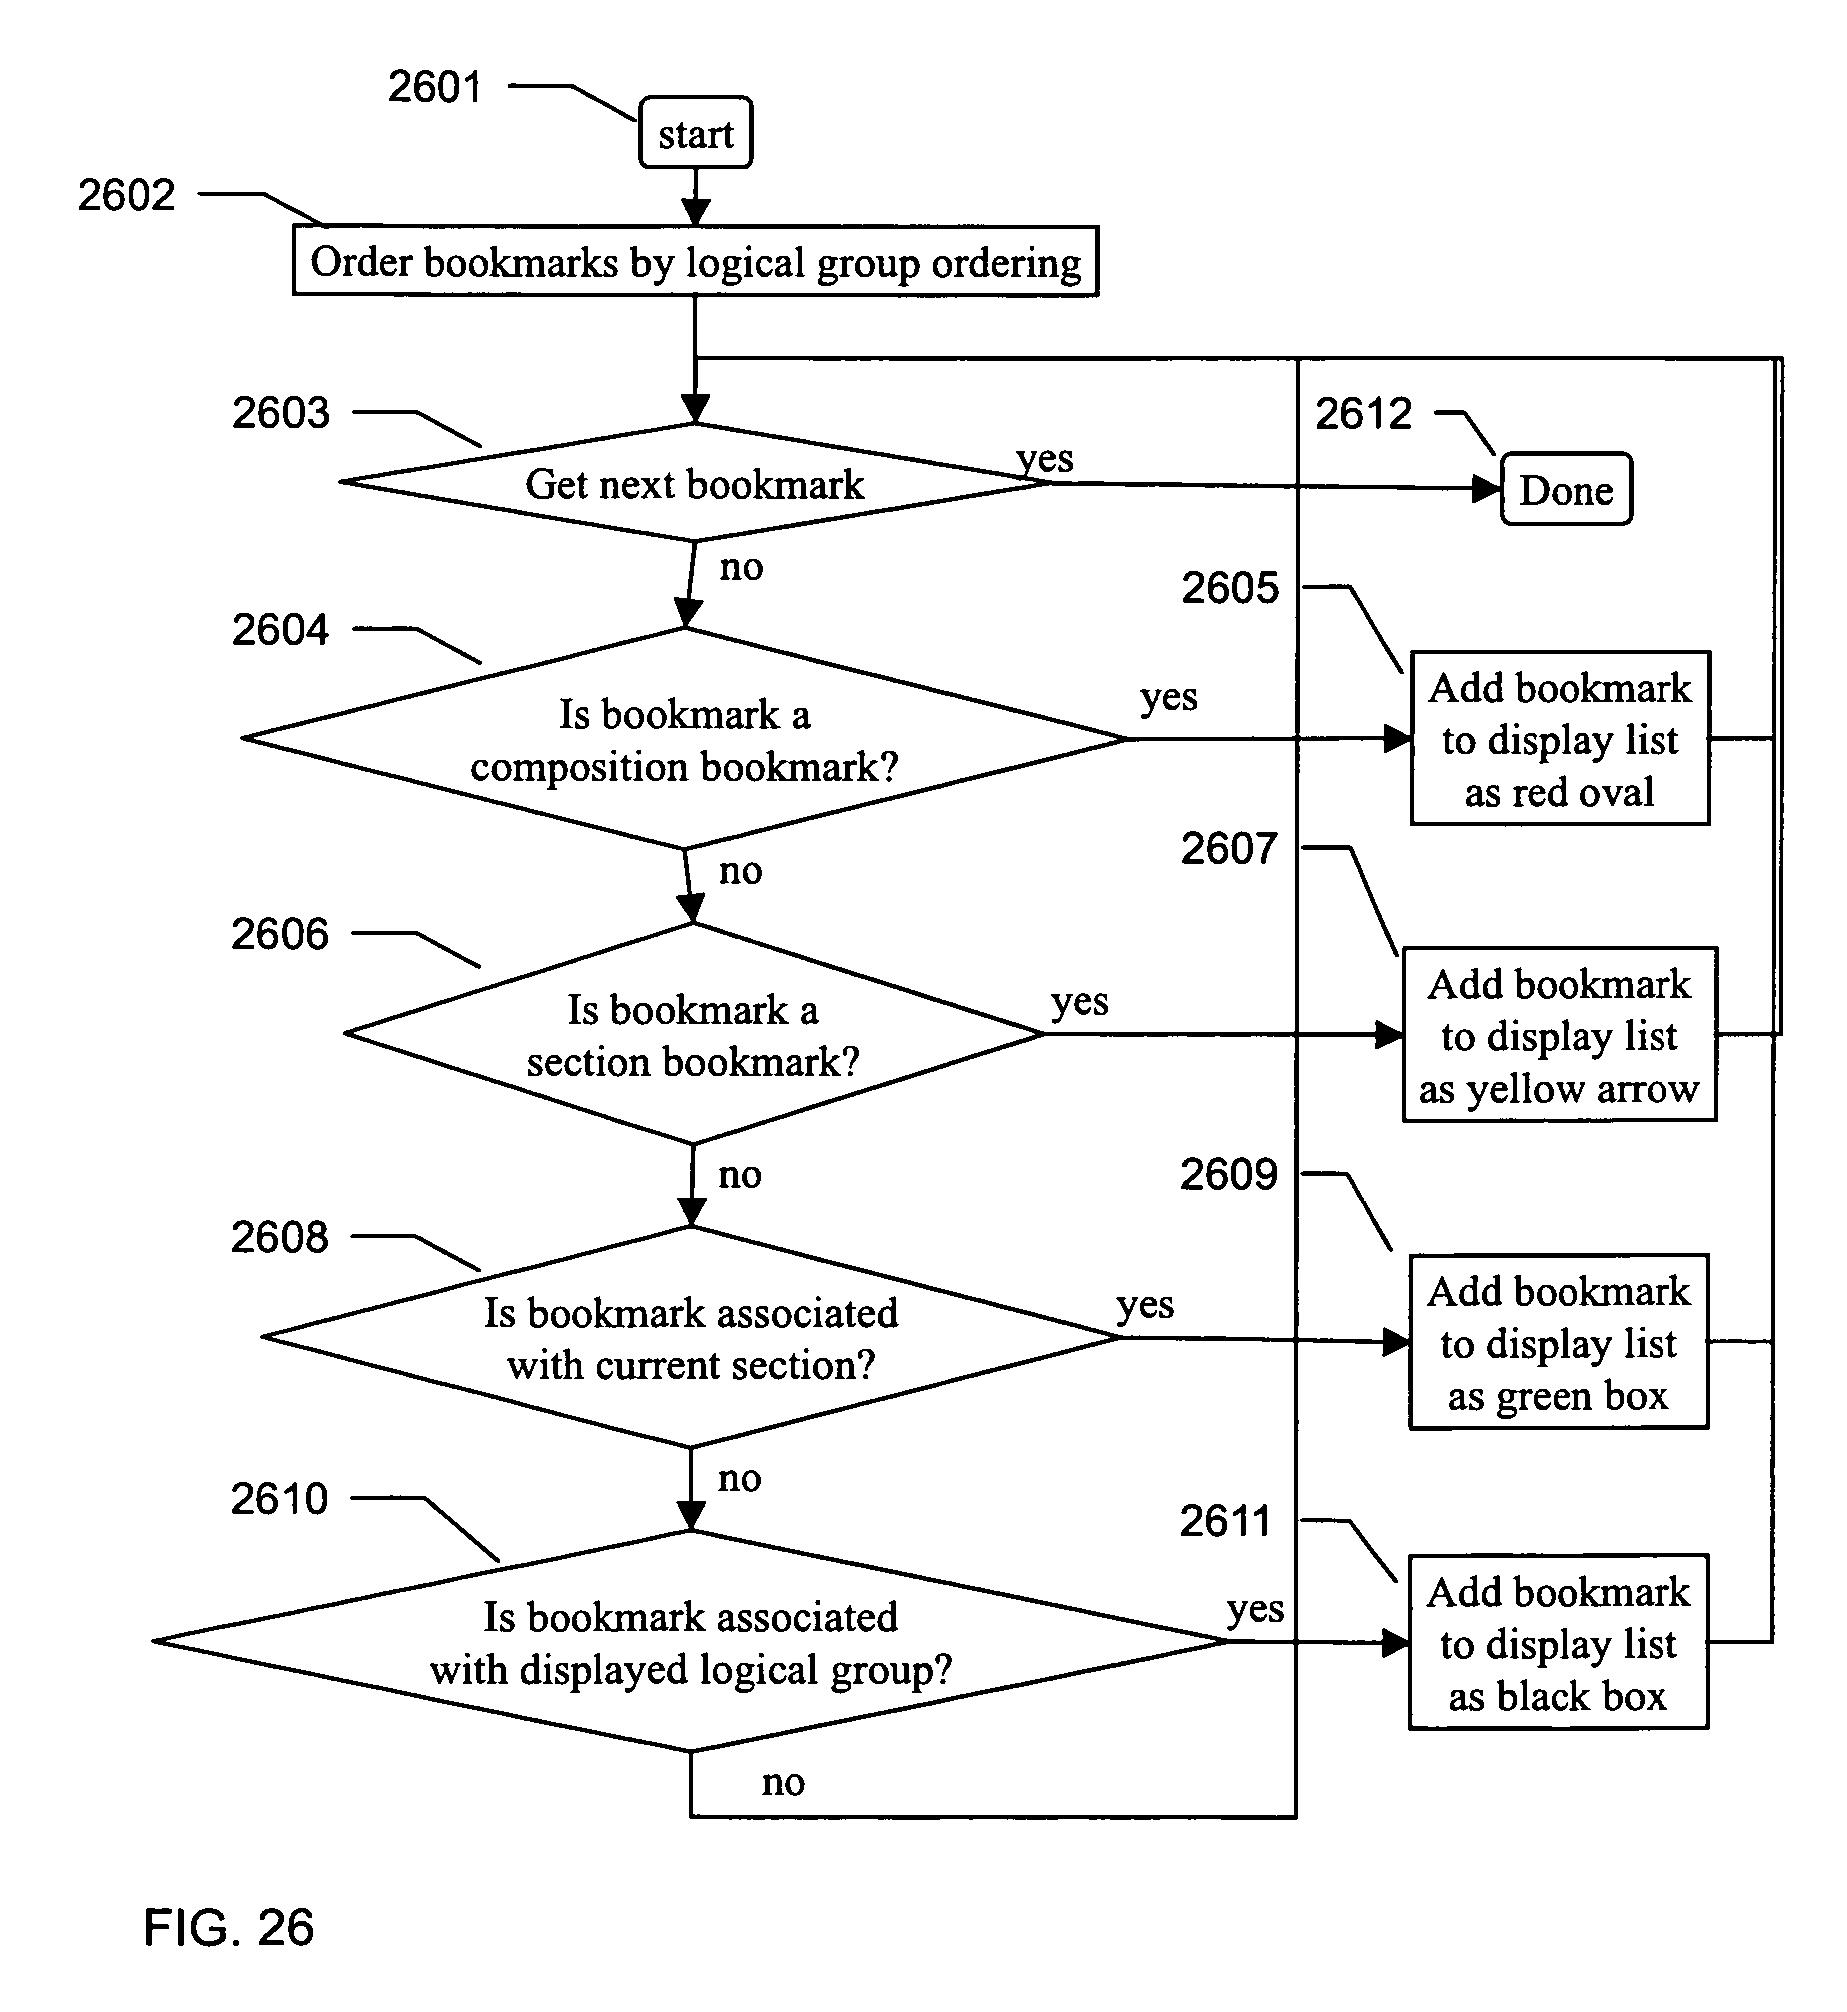 Patent US 7,612,278 B2